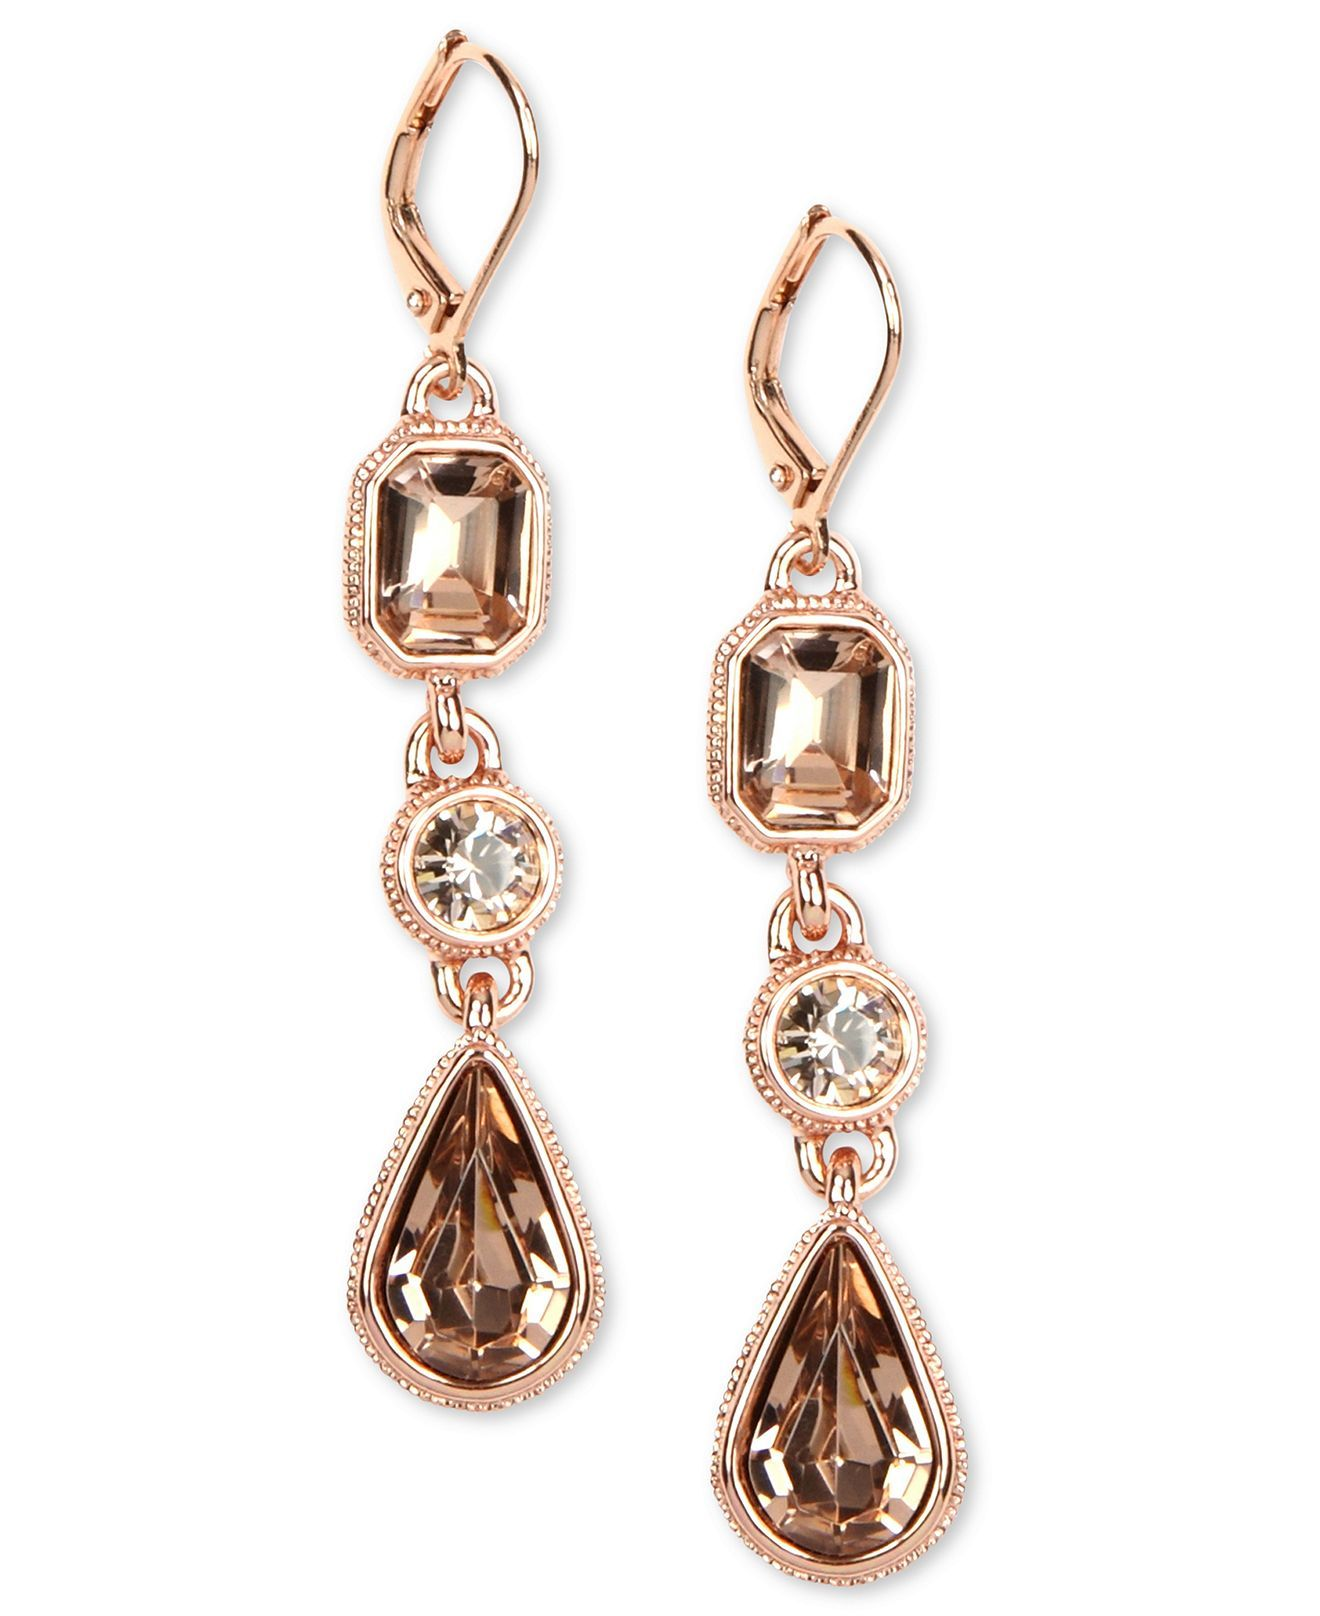 Givenchy Earrings Rose Gold Tone Crystal Triple Drop Earrings